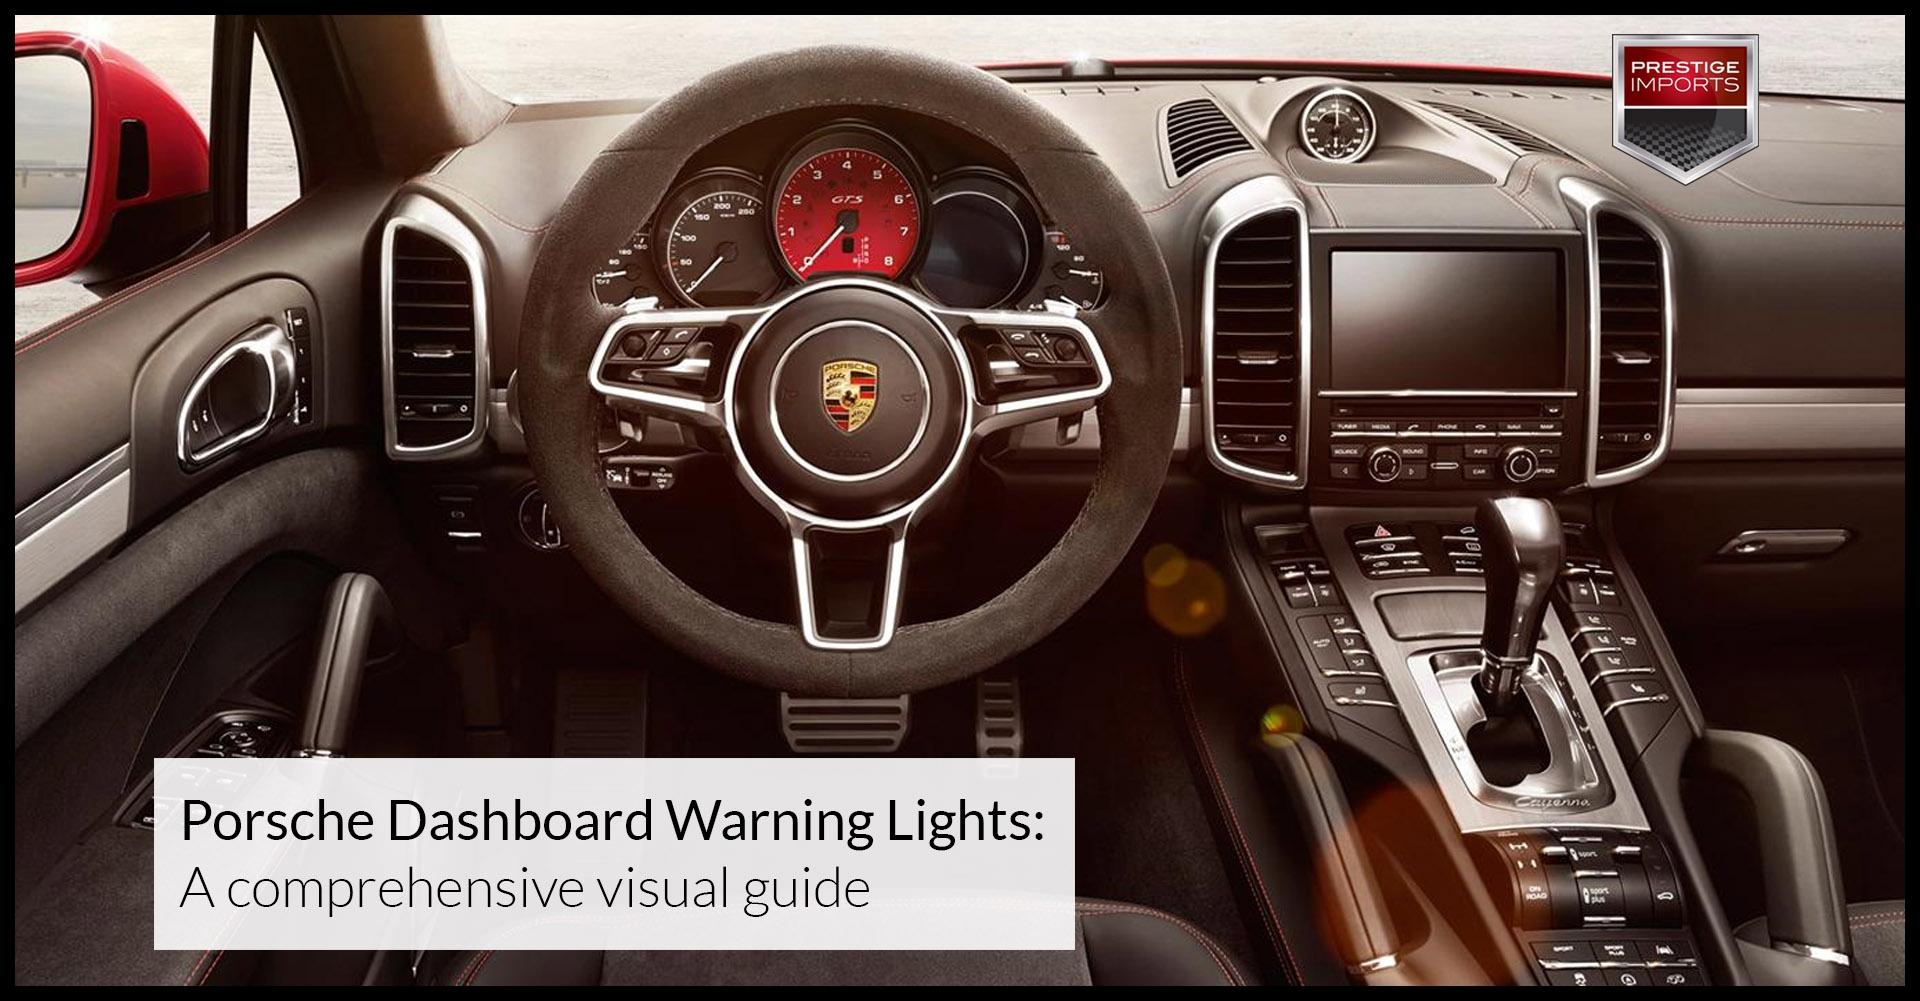 Porsche Dashboard Warning Lights A prehensive visual guide